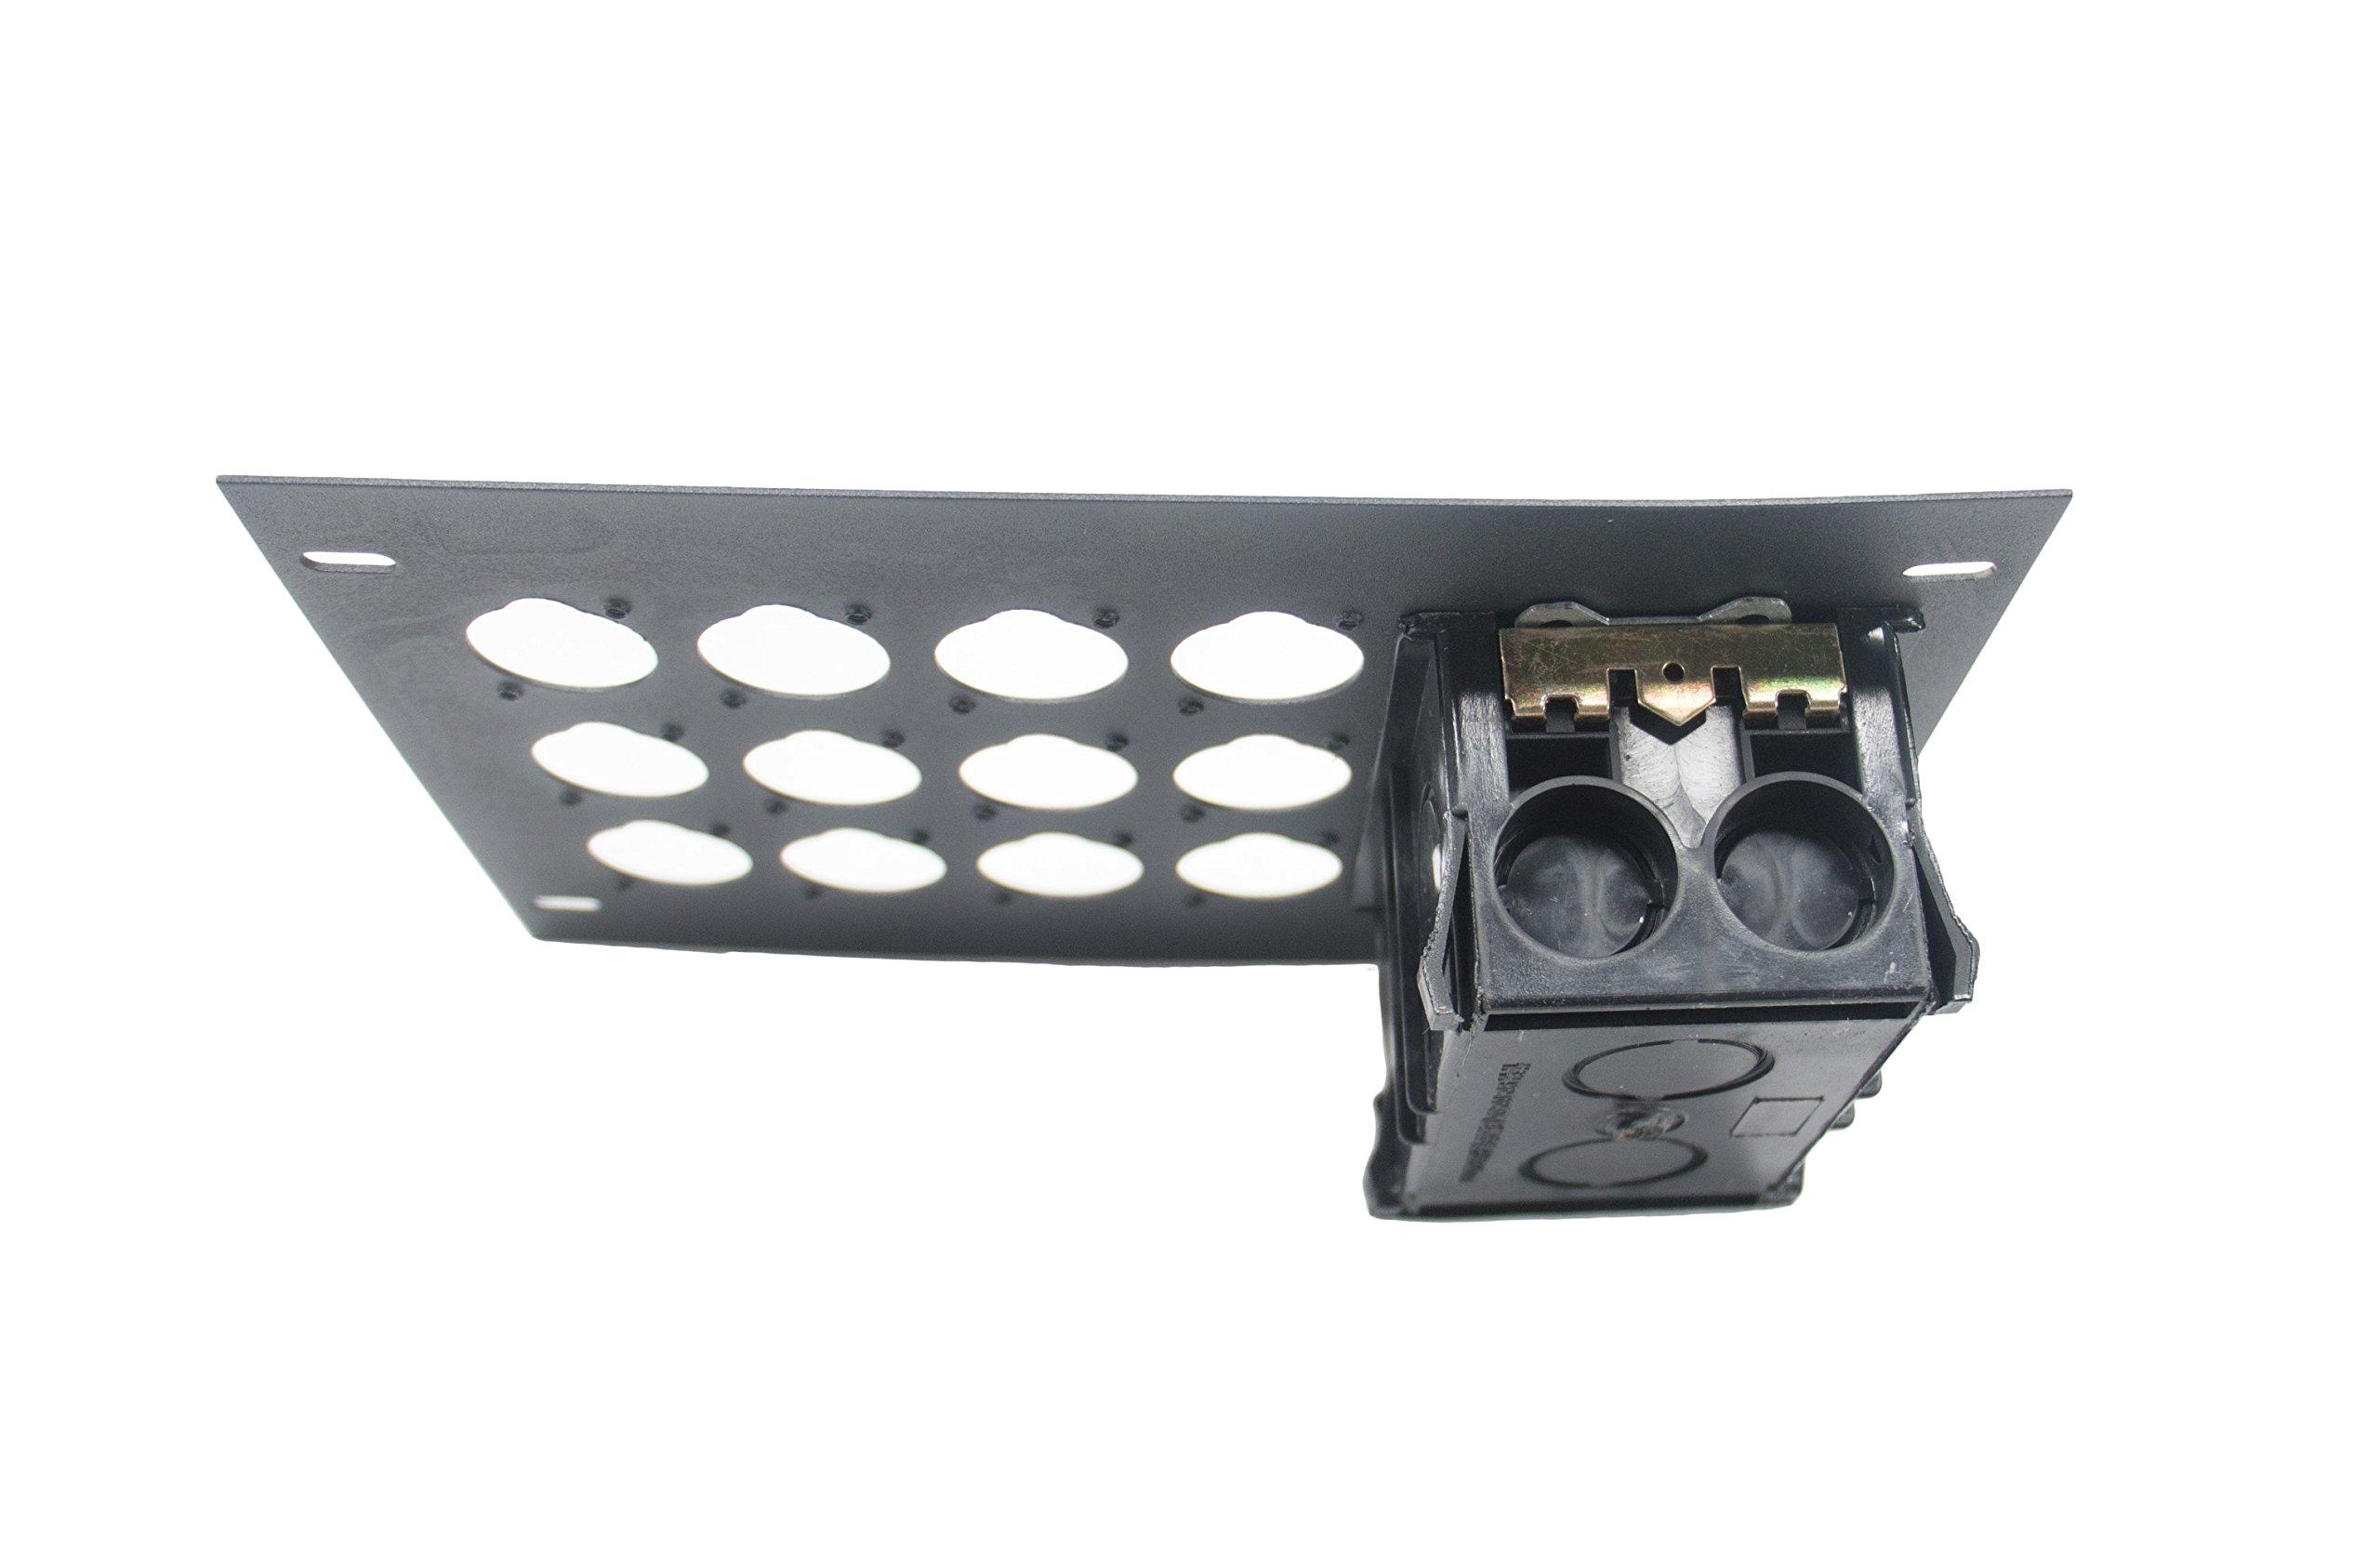 Elite Core FBL-PLATE-12+AC Plate for FBL Floor Box With AC Duplex - no connectors by Elite Core (Image #1)